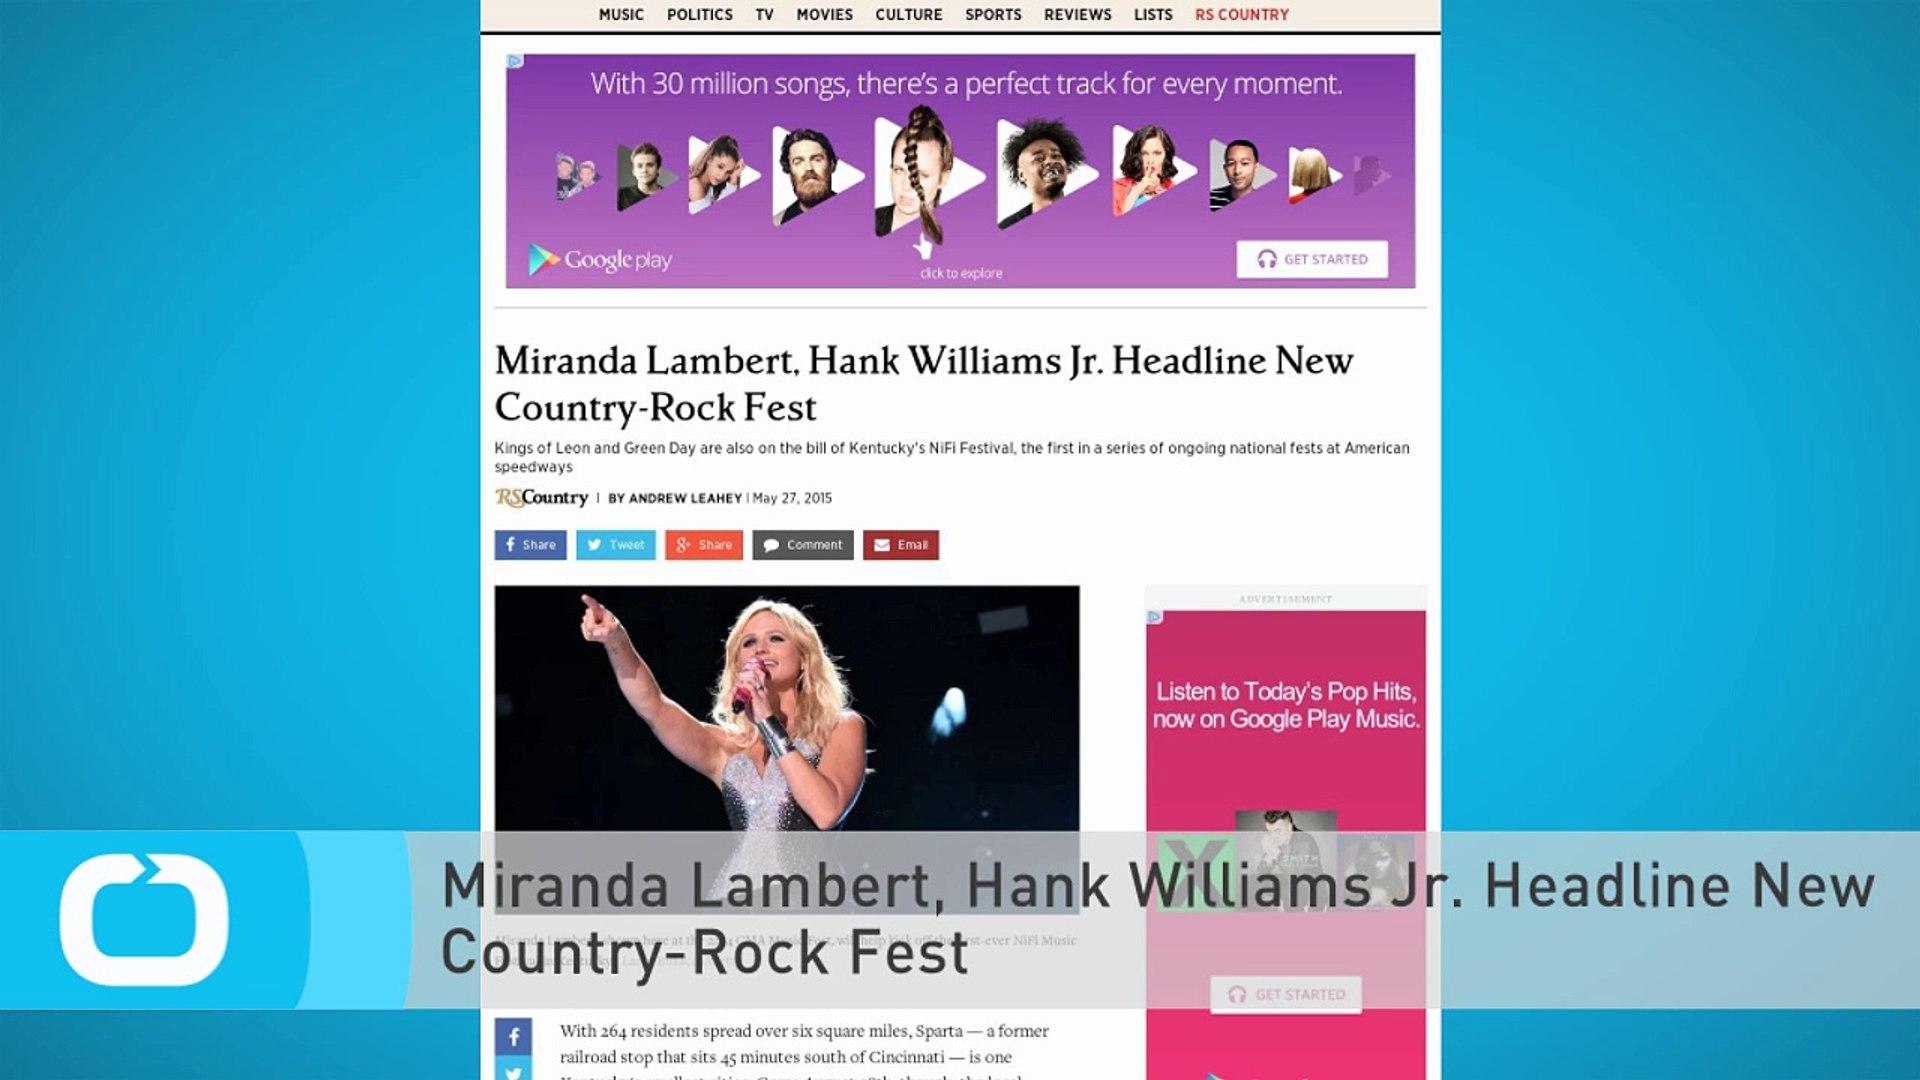 Miranda Lambert, Hank Williams Jr. Headline New Country-Rock Fest